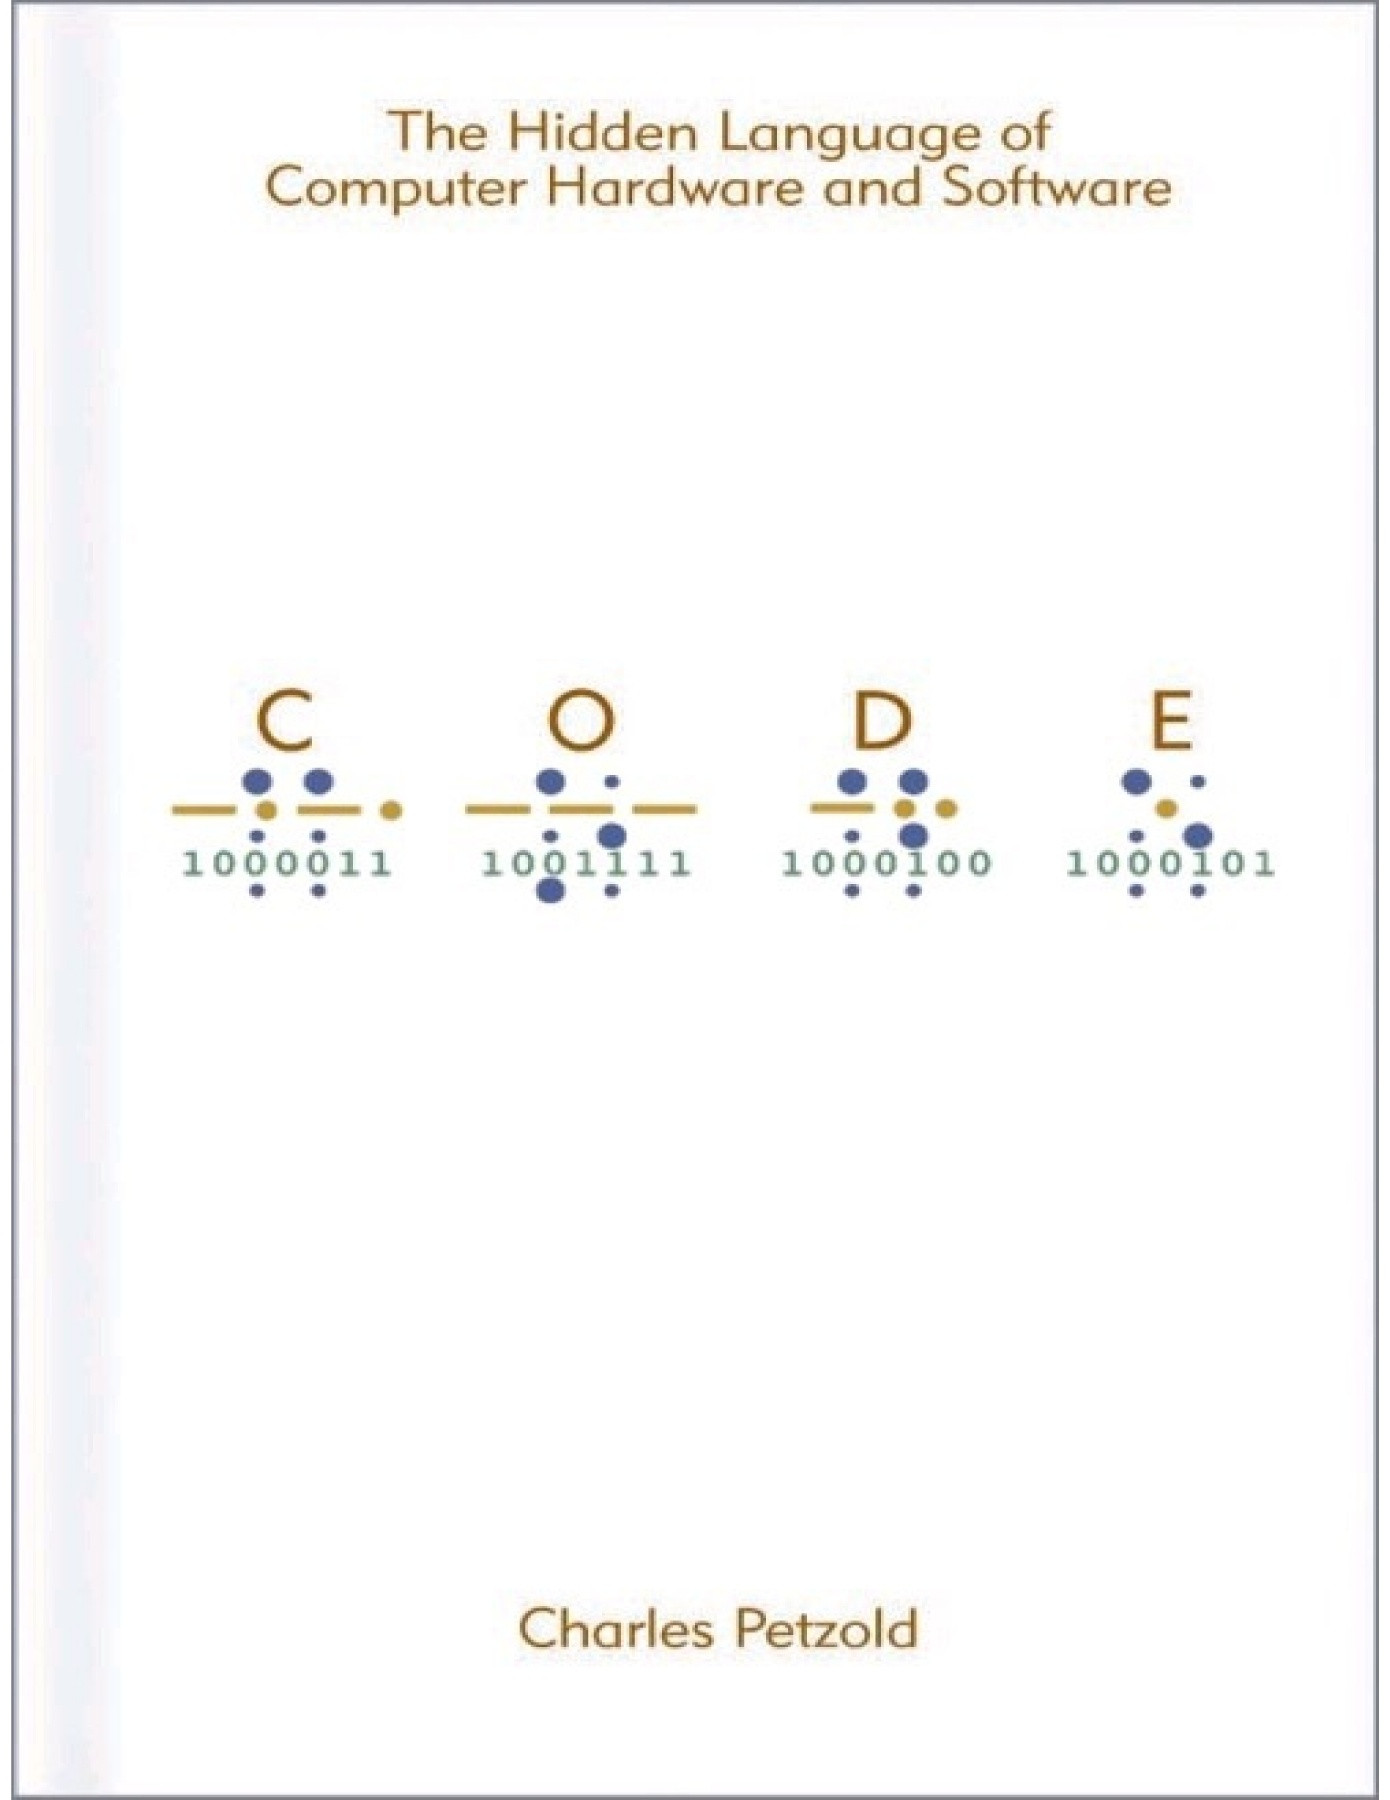 4 Free Math Worksheets Second Grade 2 Addition Add 2 Digit